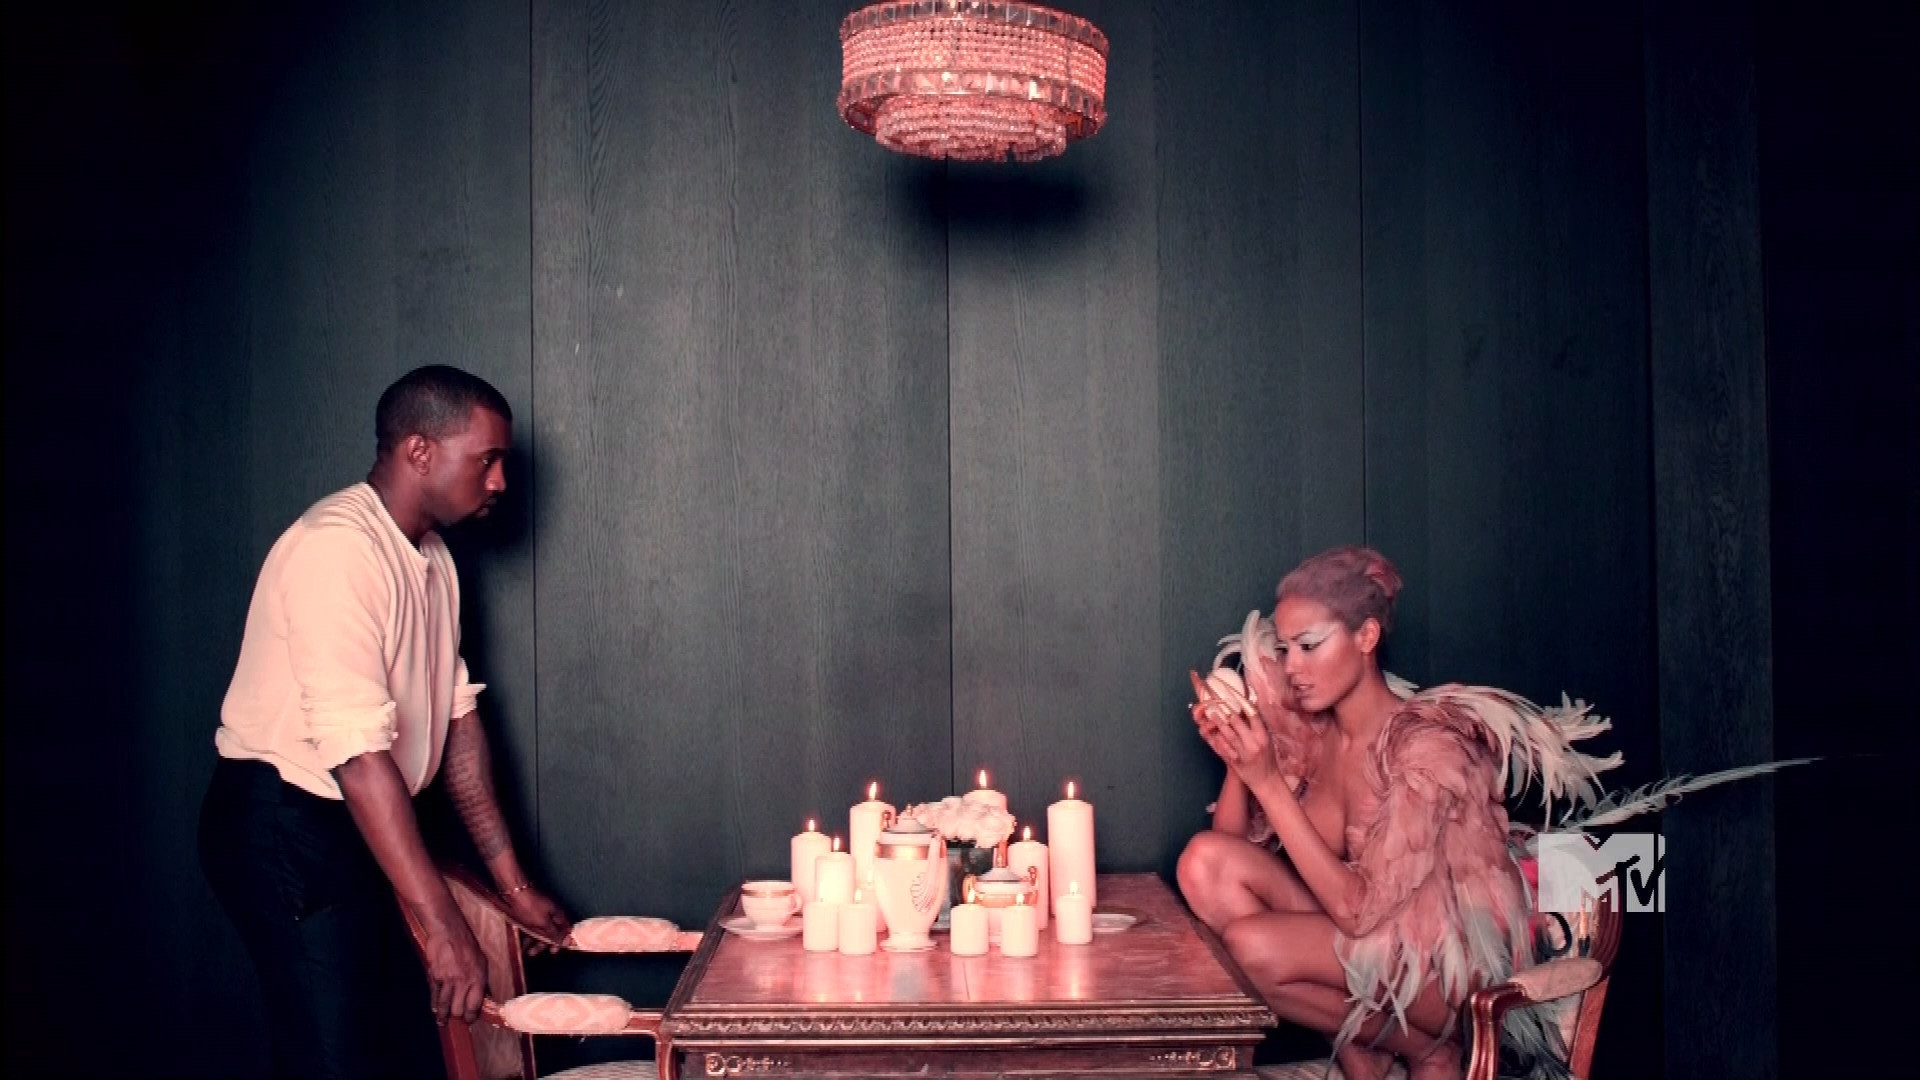 Kanye West Runaway Wallpaper 1080p